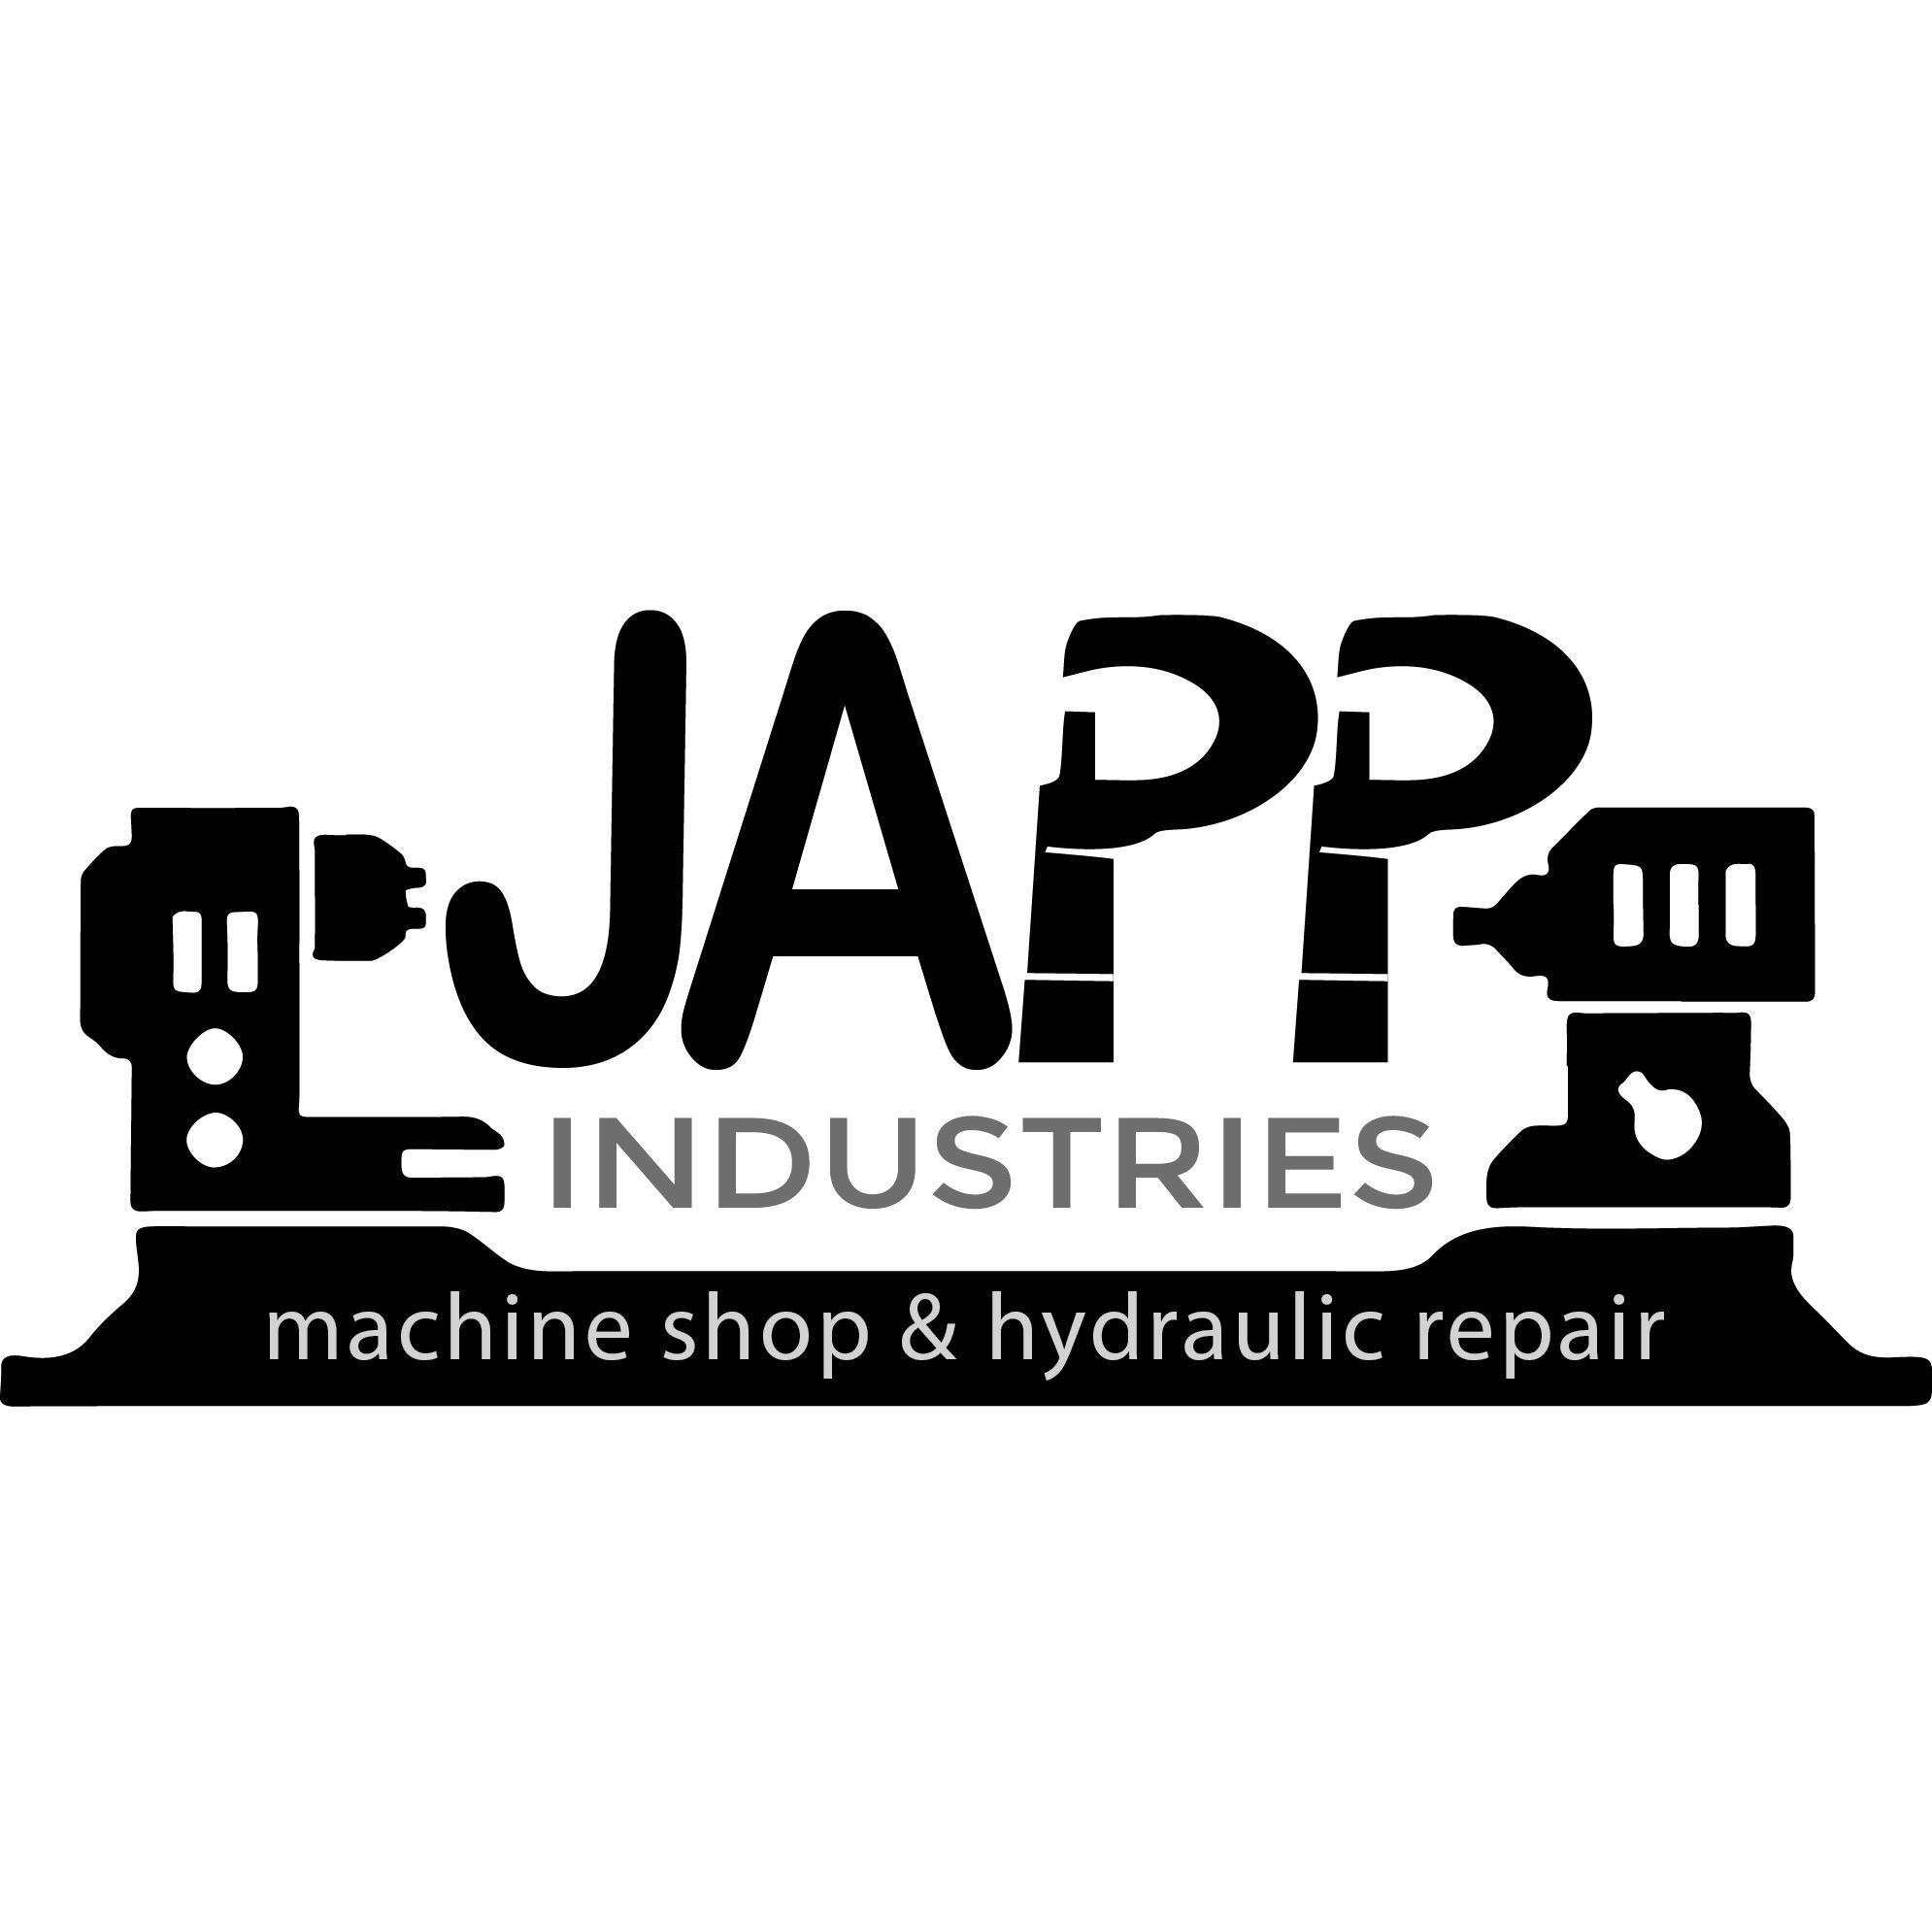 Japp Industries, Inc. image 0